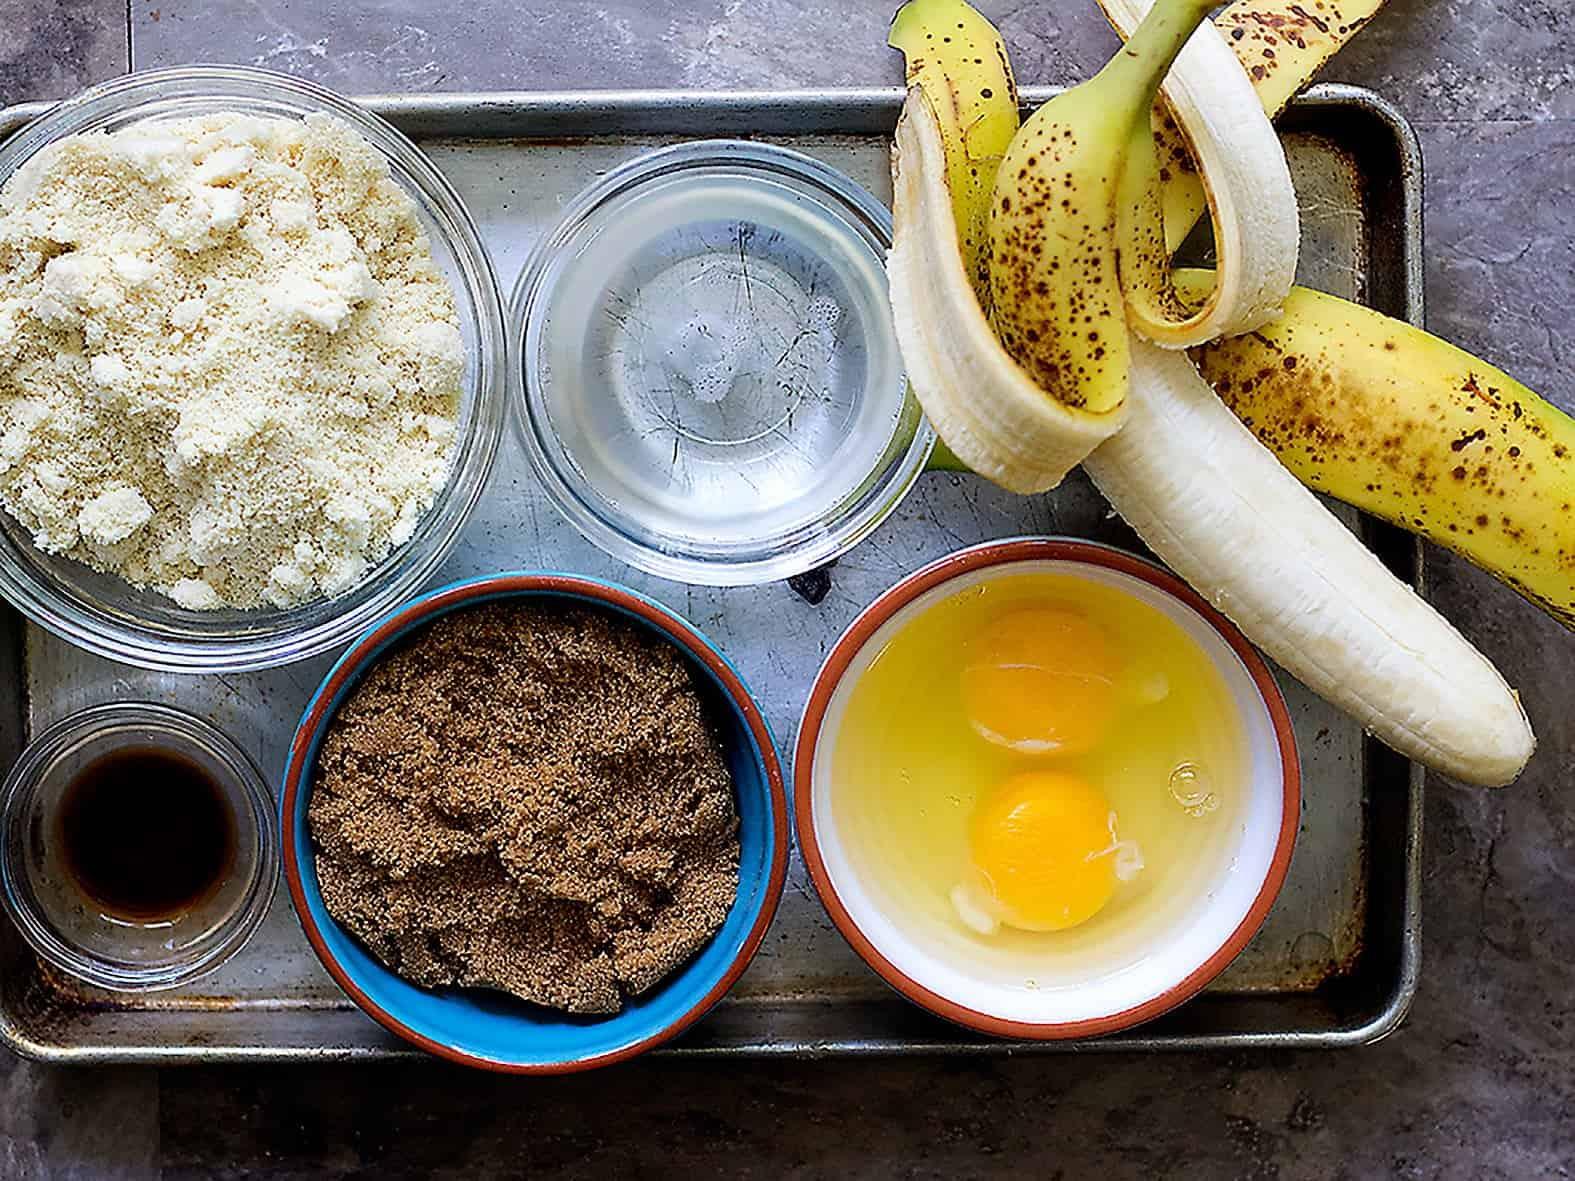 To make almond flour banana bread you need almond flour, coconut oil, bananas, eggs, brown sugar and vanilla.